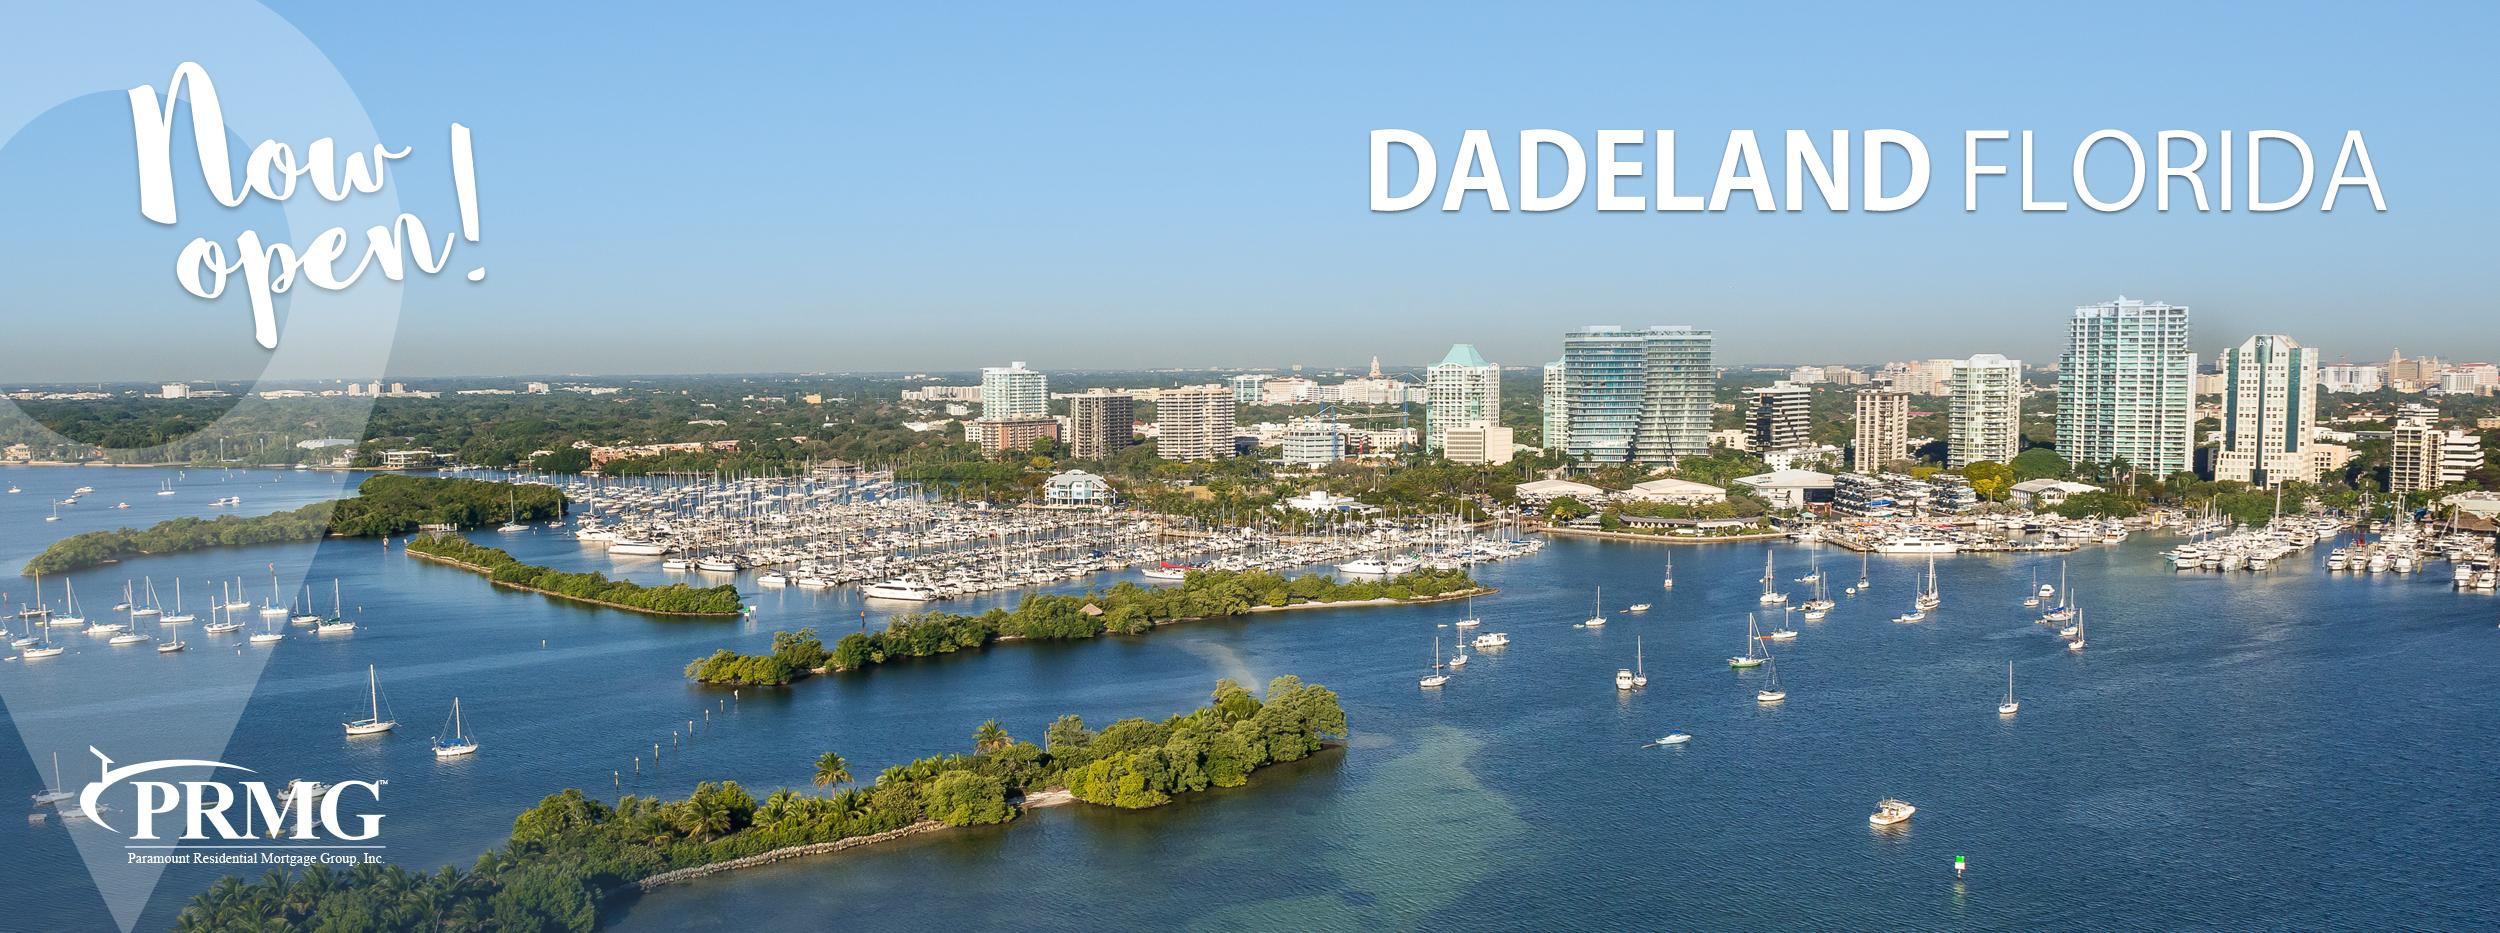 Dadeland, FL - Header.jpg